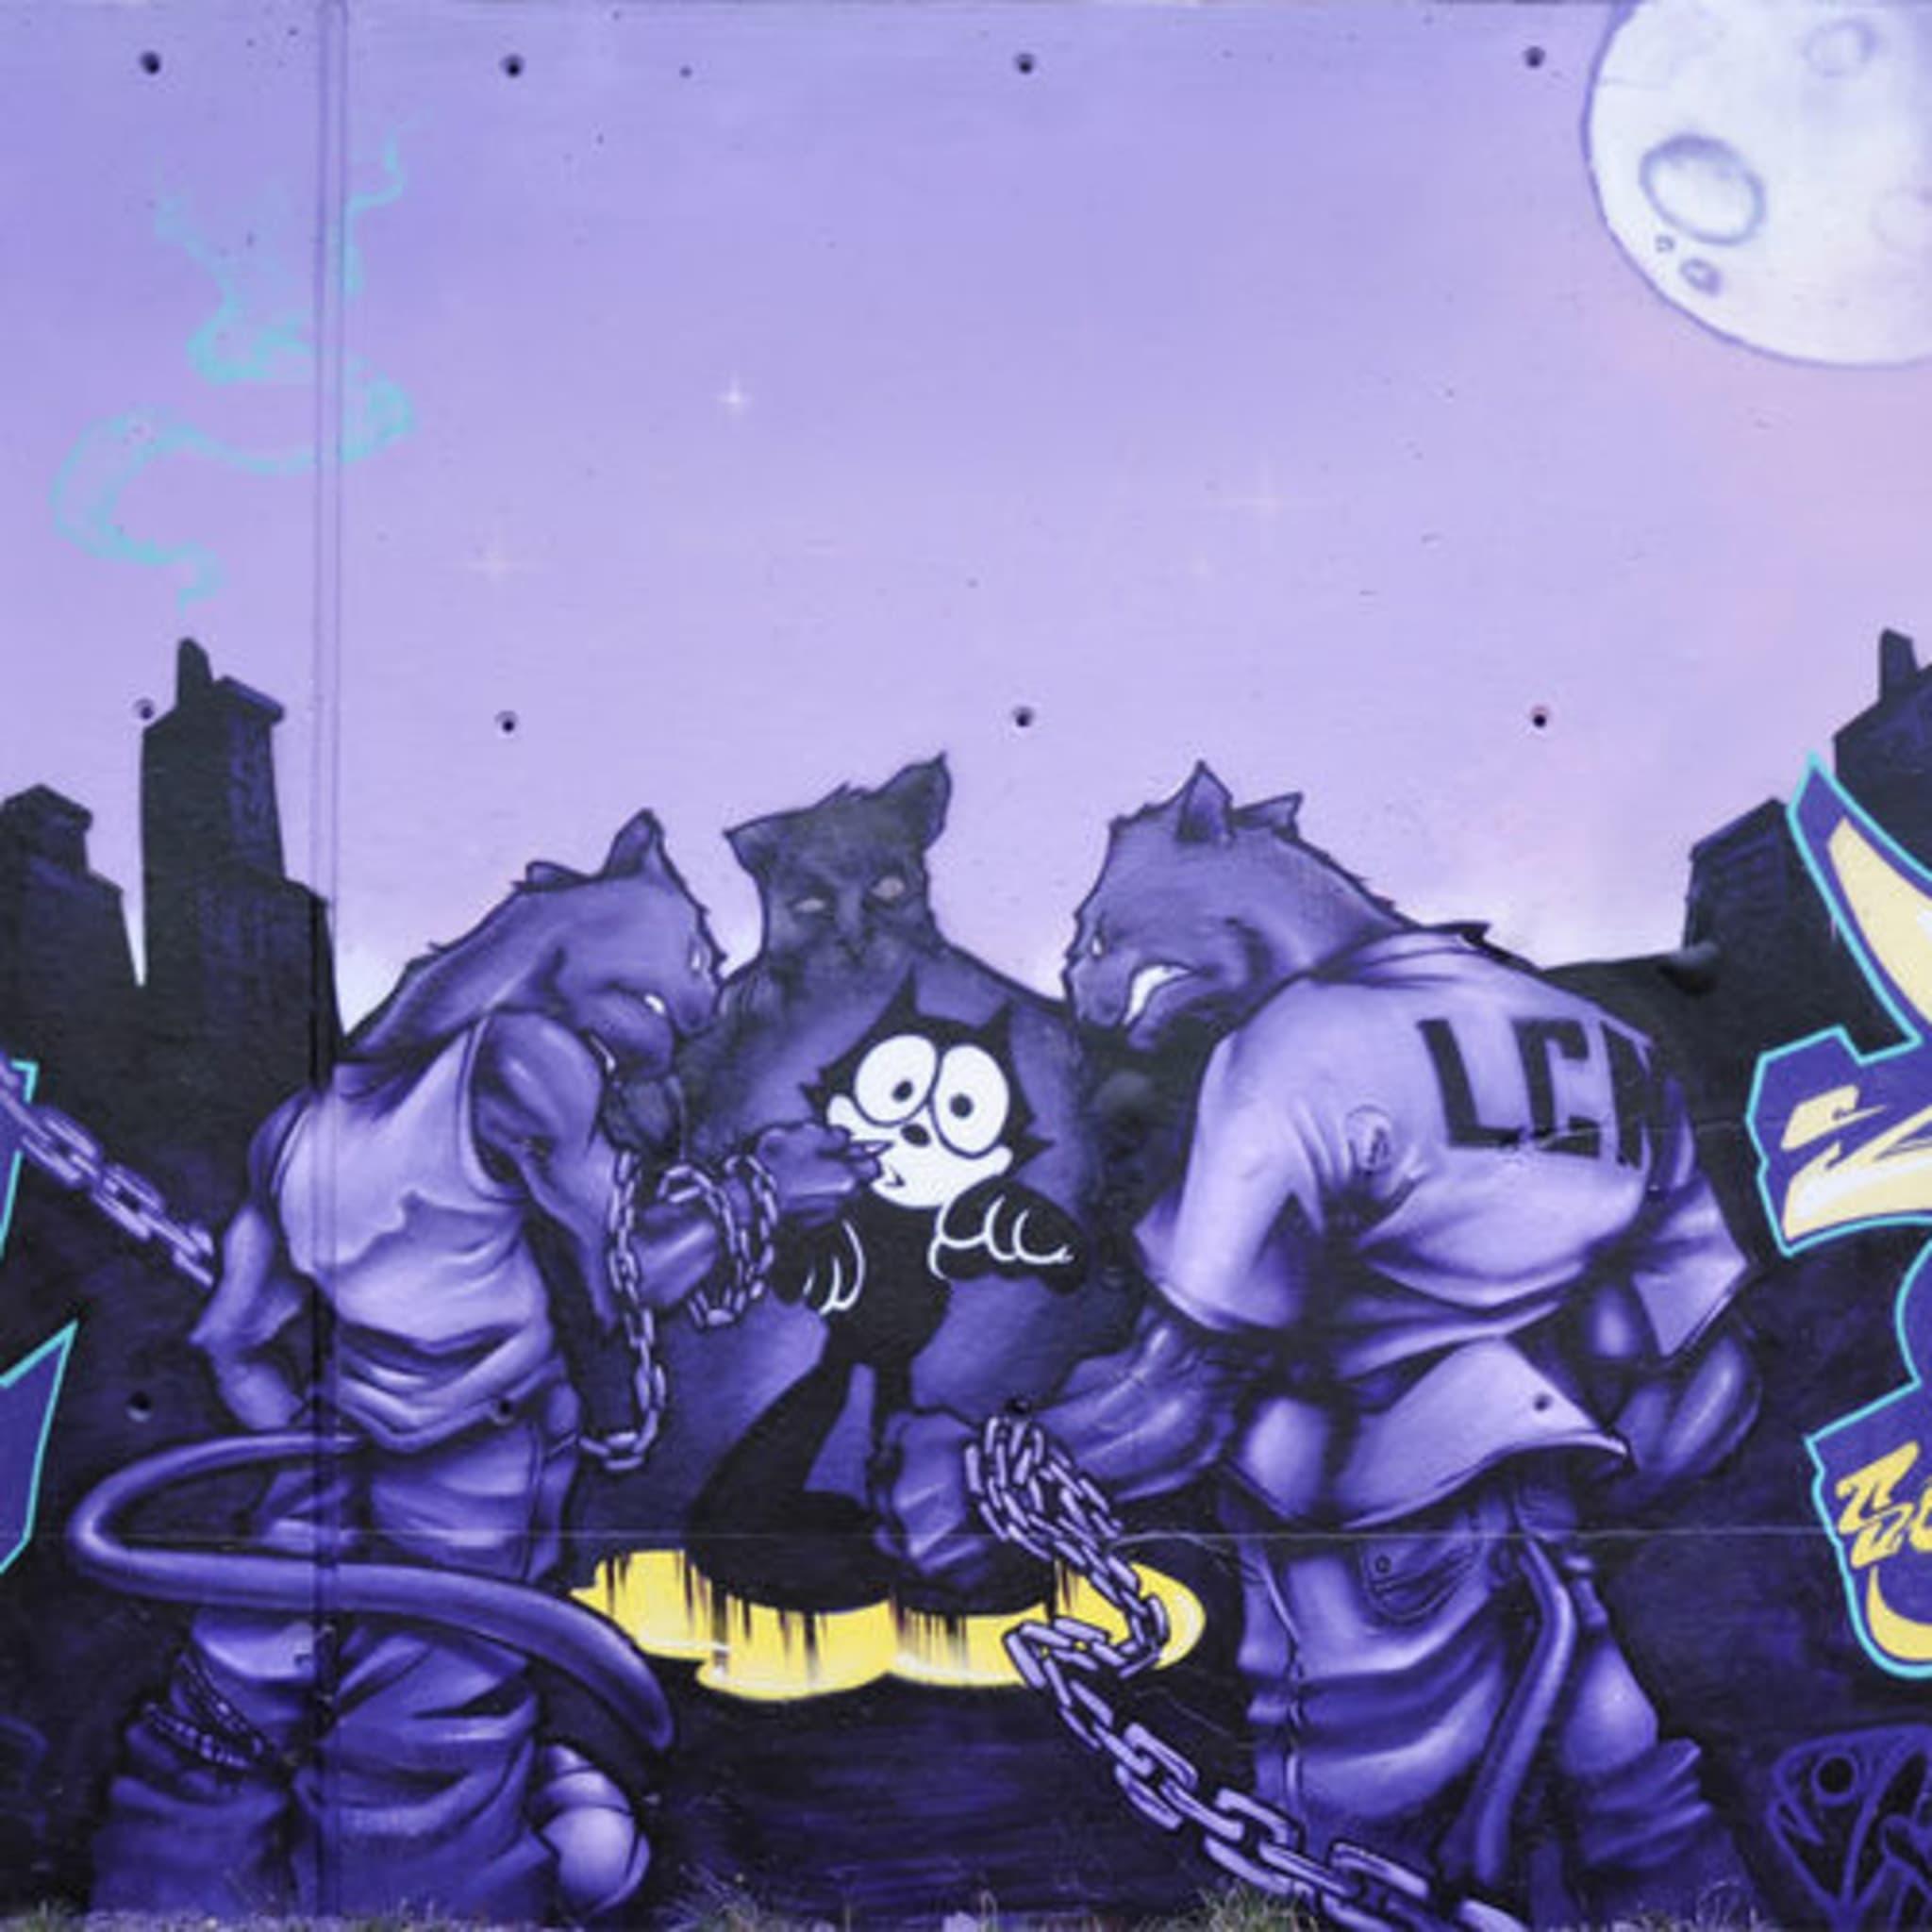 Artwork By Socrome in Saint-Denis